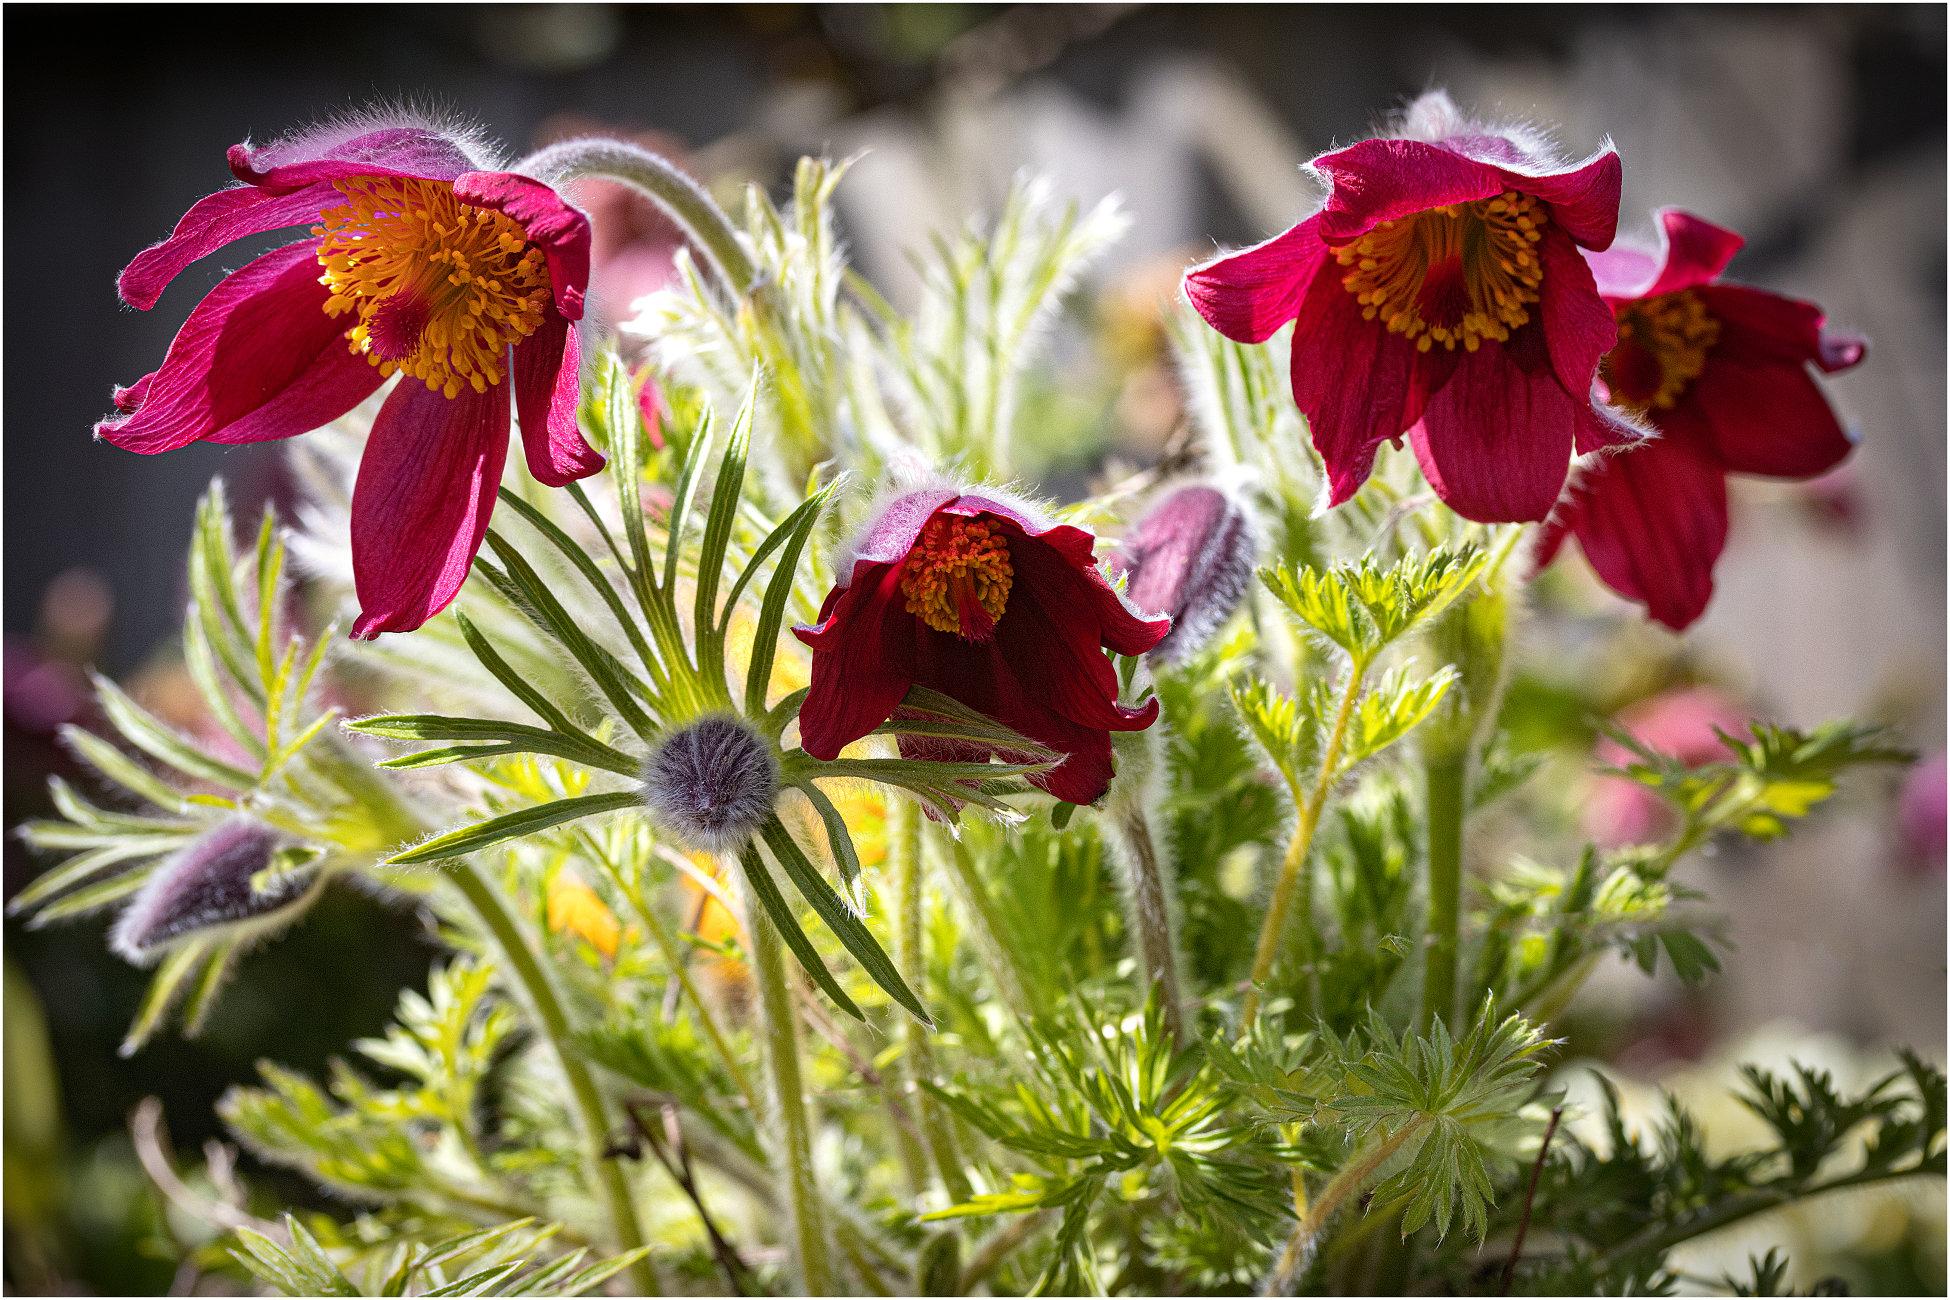 Pulsatilla Red Pasque Flower